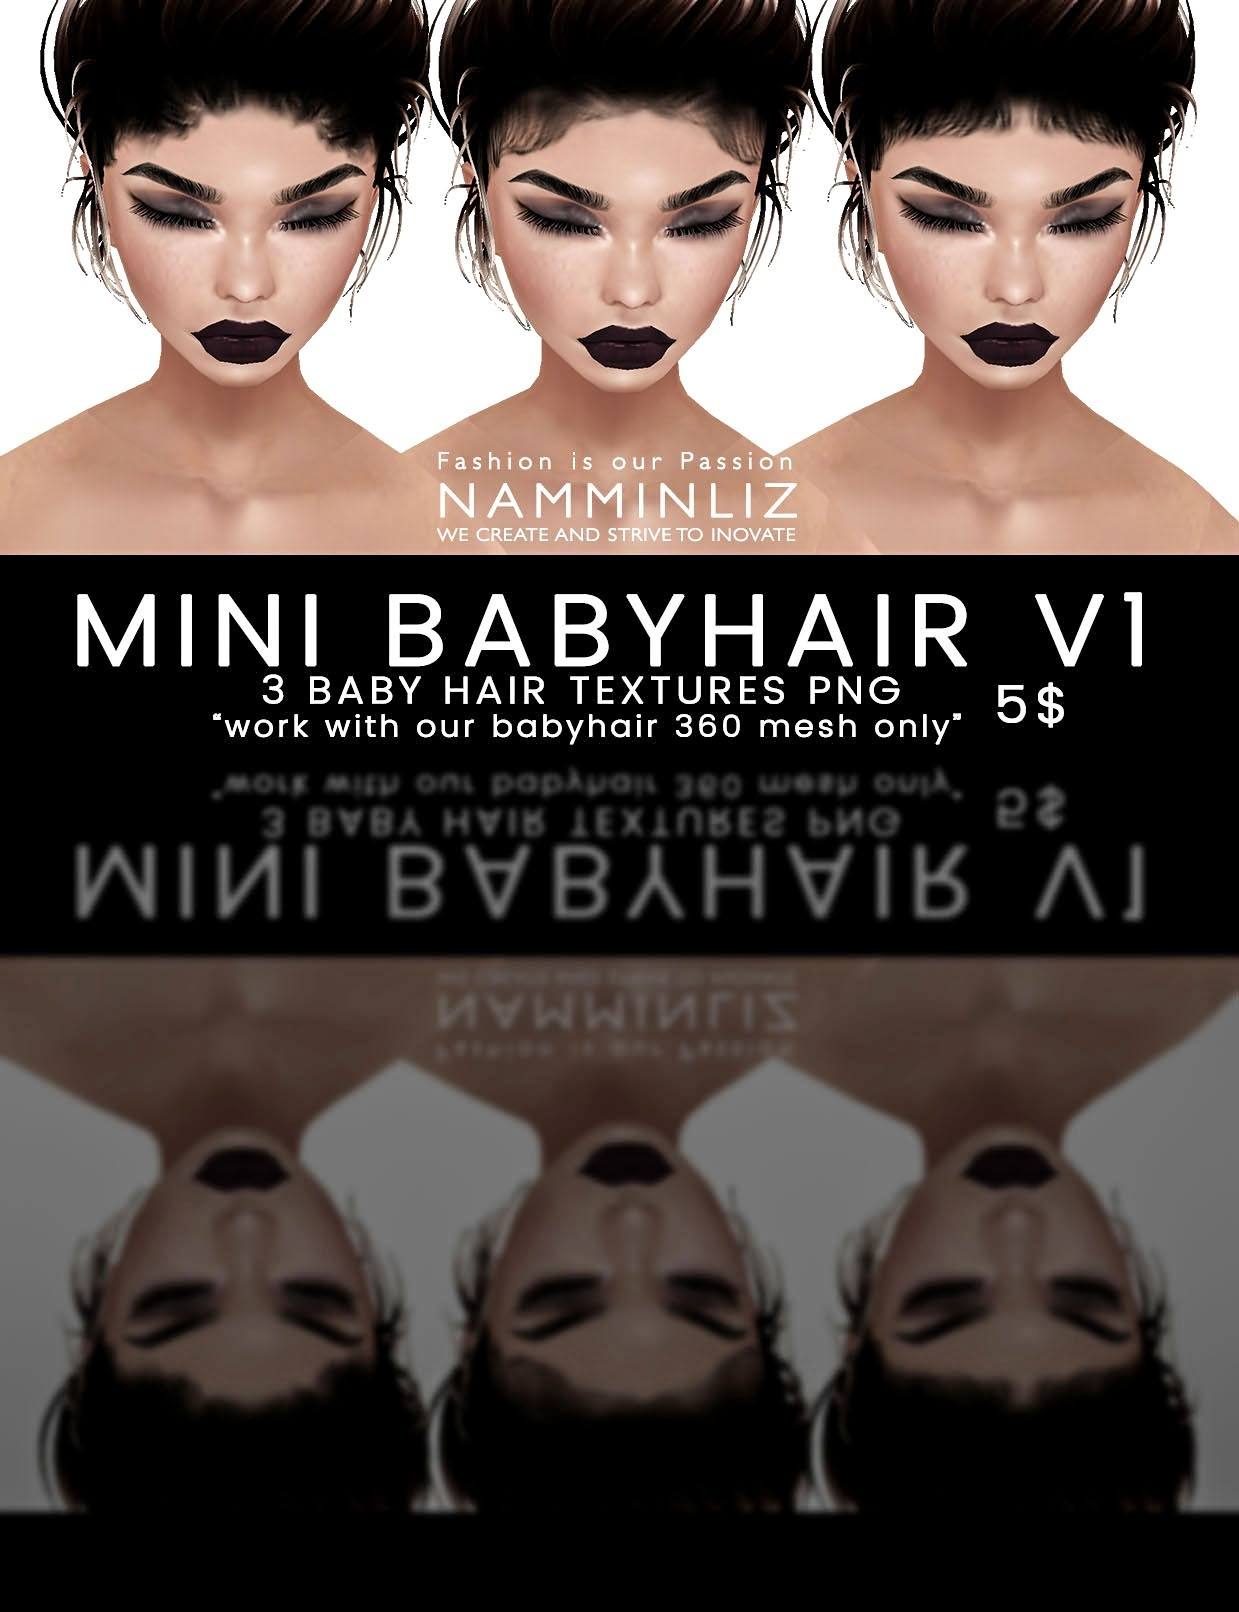 Mini Babyhair V1 ( 3 Textures PNG ) imvu namminliz